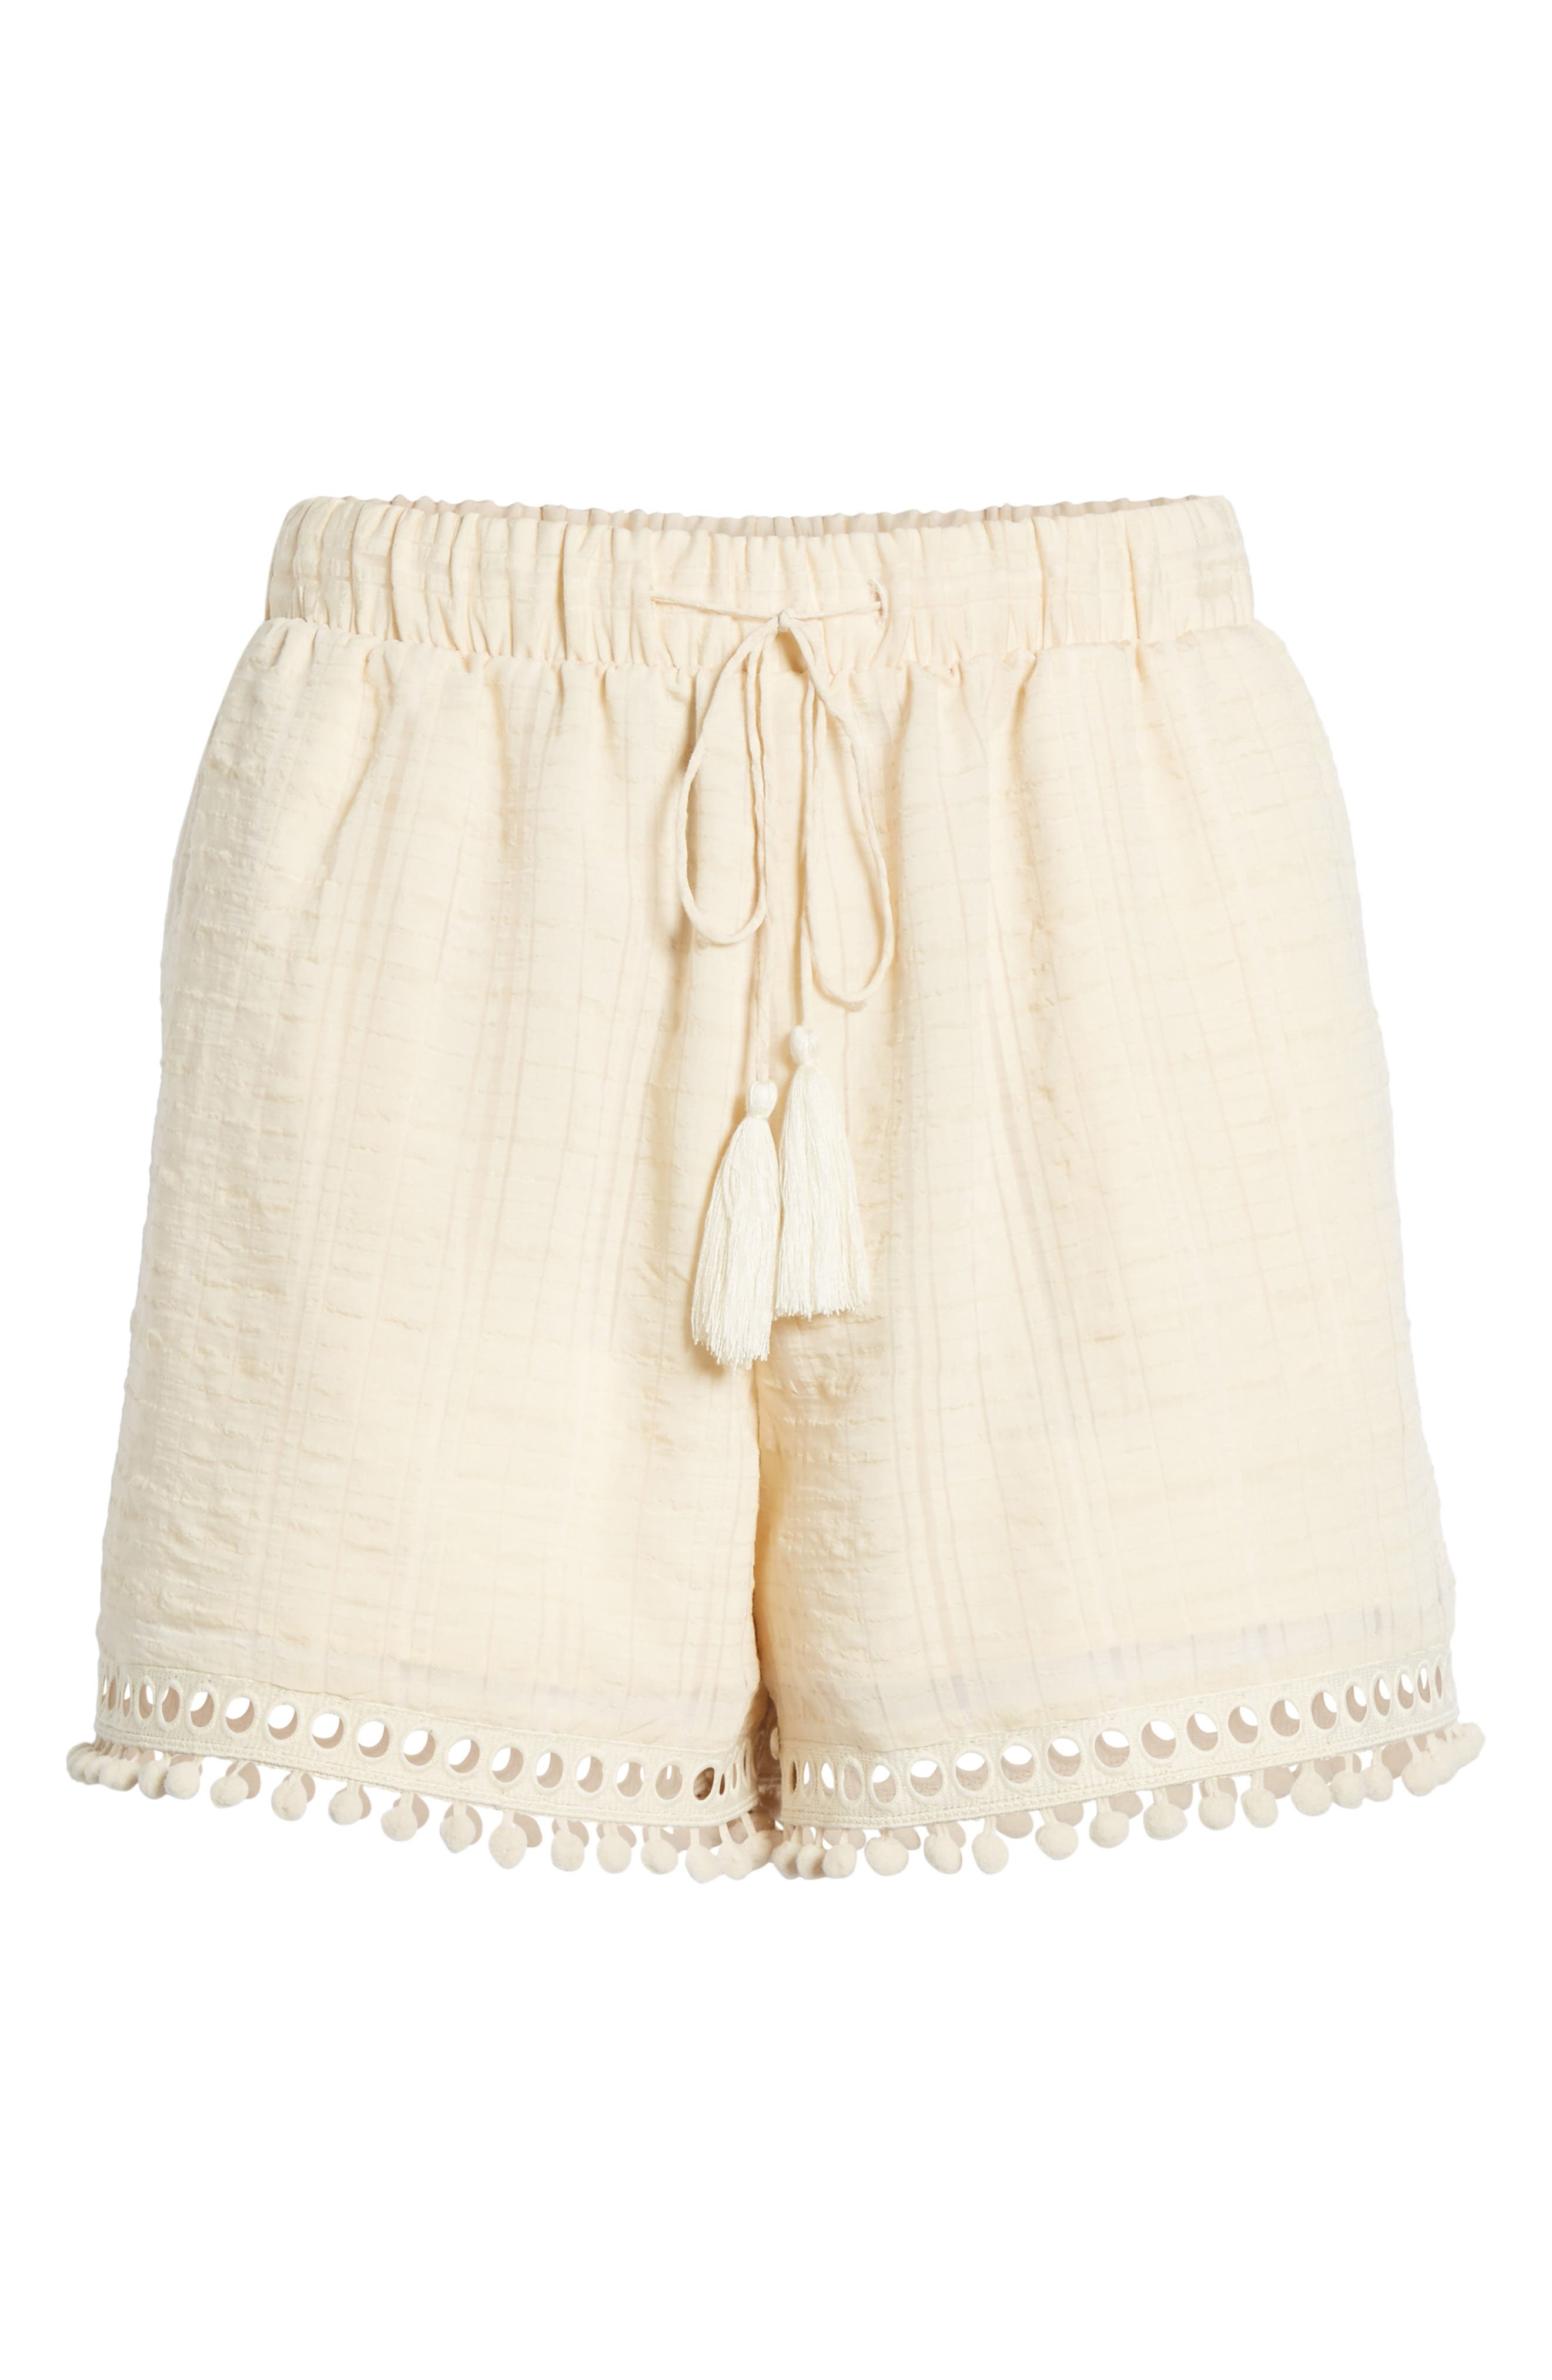 Pompom Trim Shorts,                             Alternate thumbnail 7, color,                             Light Peach